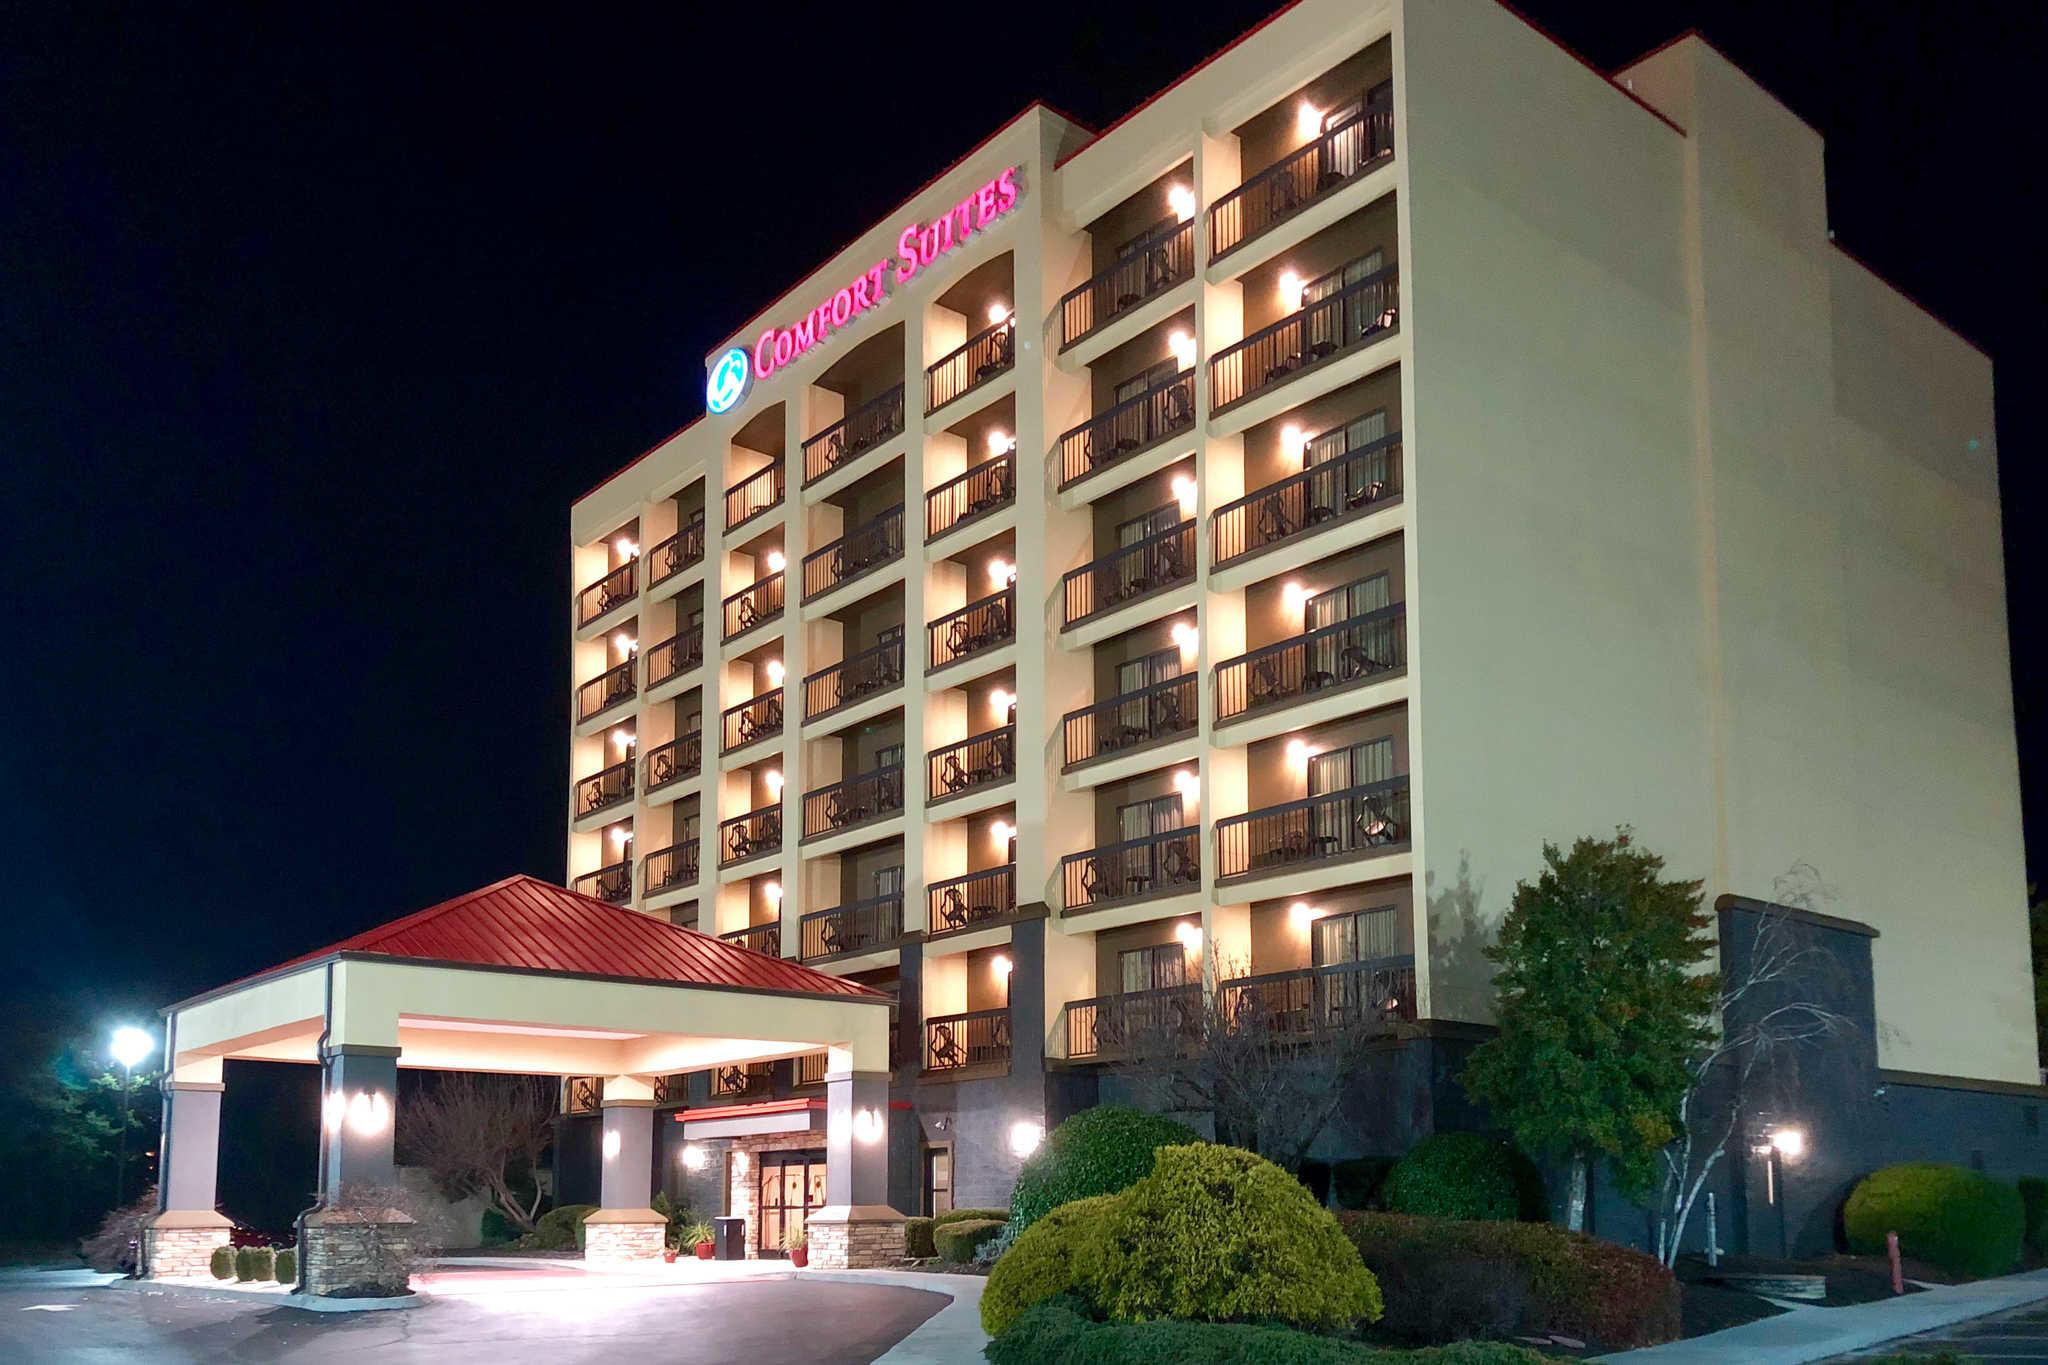 Comfort Suites Mountain Mile Area image 1